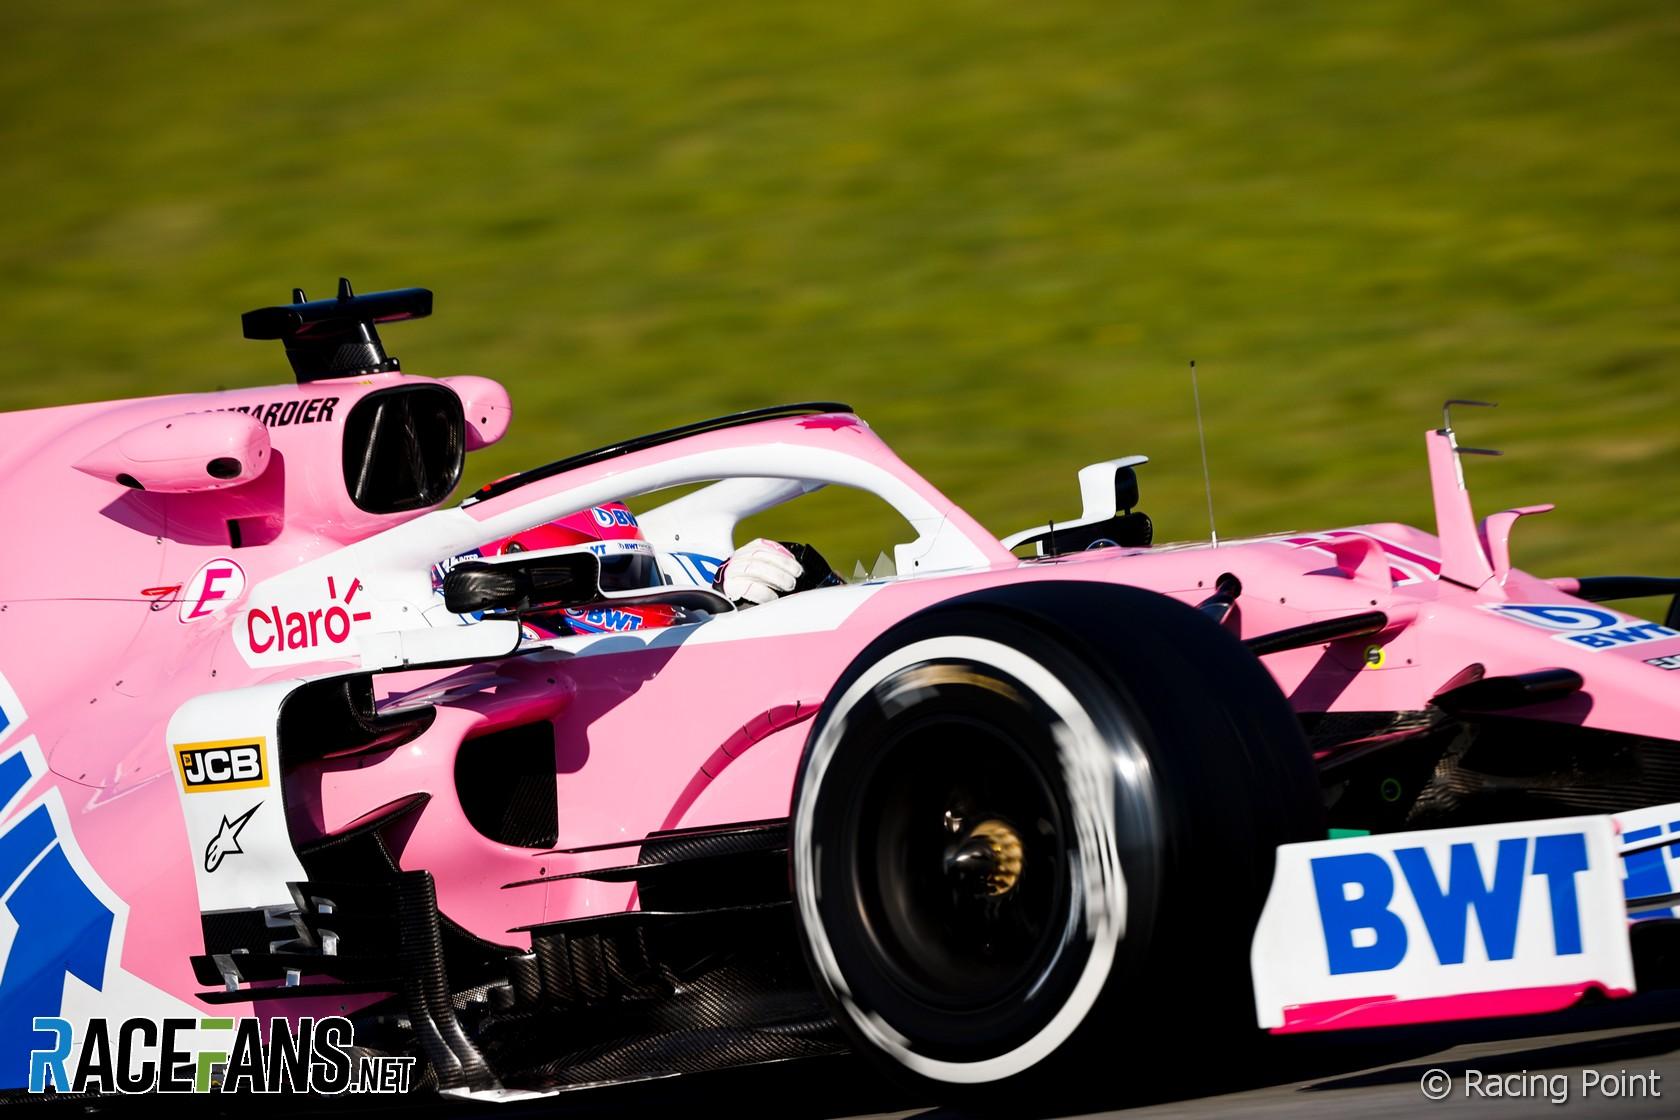 Sergio Perez, Racing Point, Circuit de Catalunya, 2020